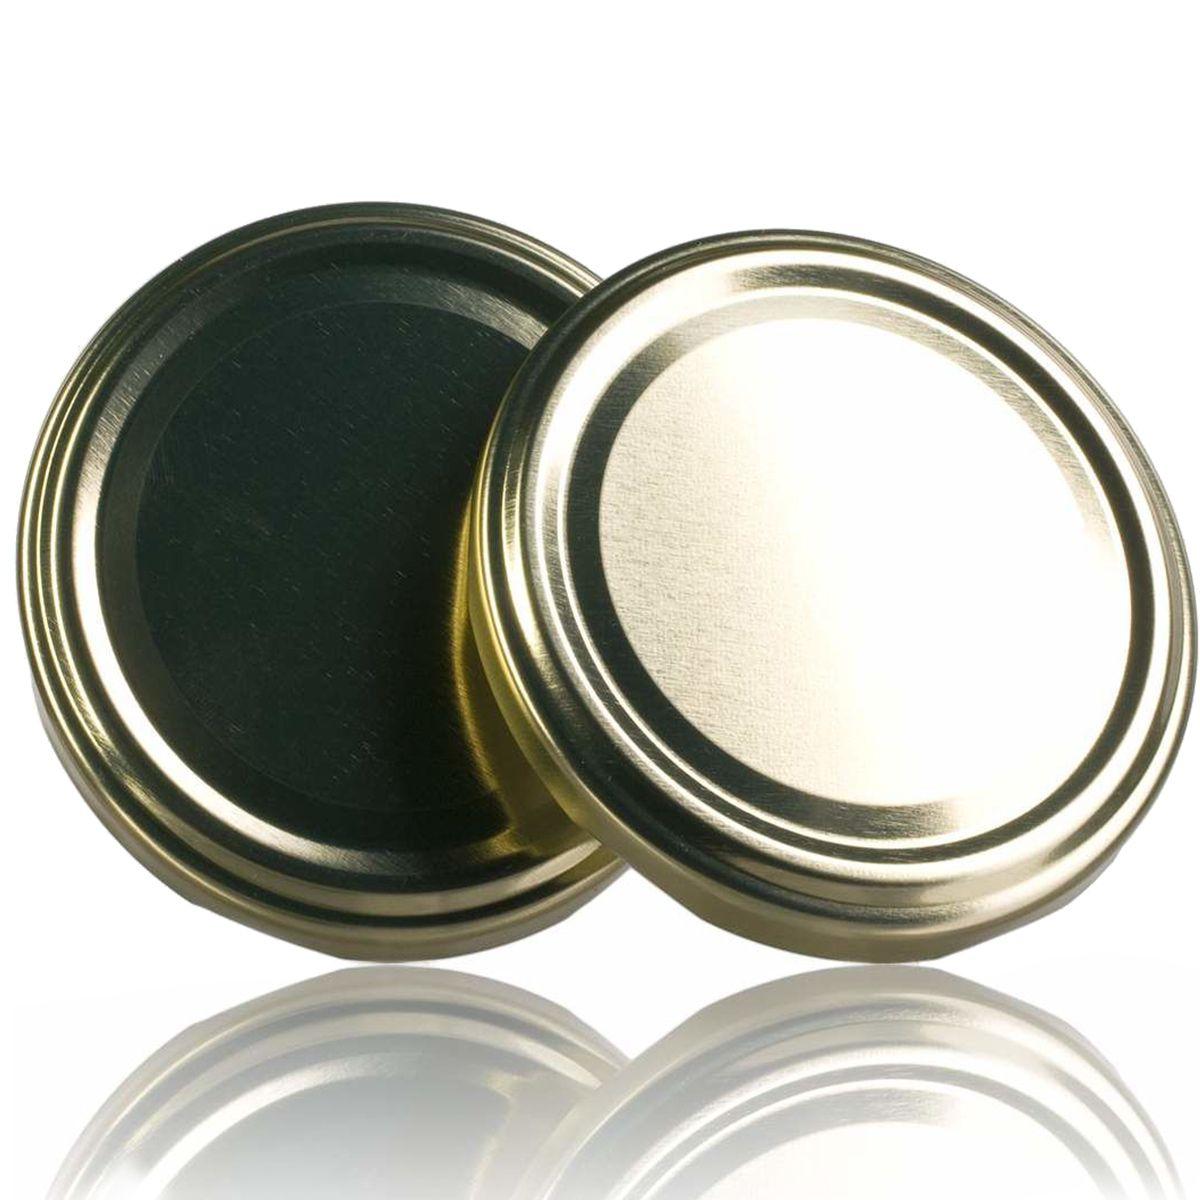 48 Potes De Vidro Mini Belém 150 Ml Tampa Dourada + Lacre  - EMPÓRIO PACK